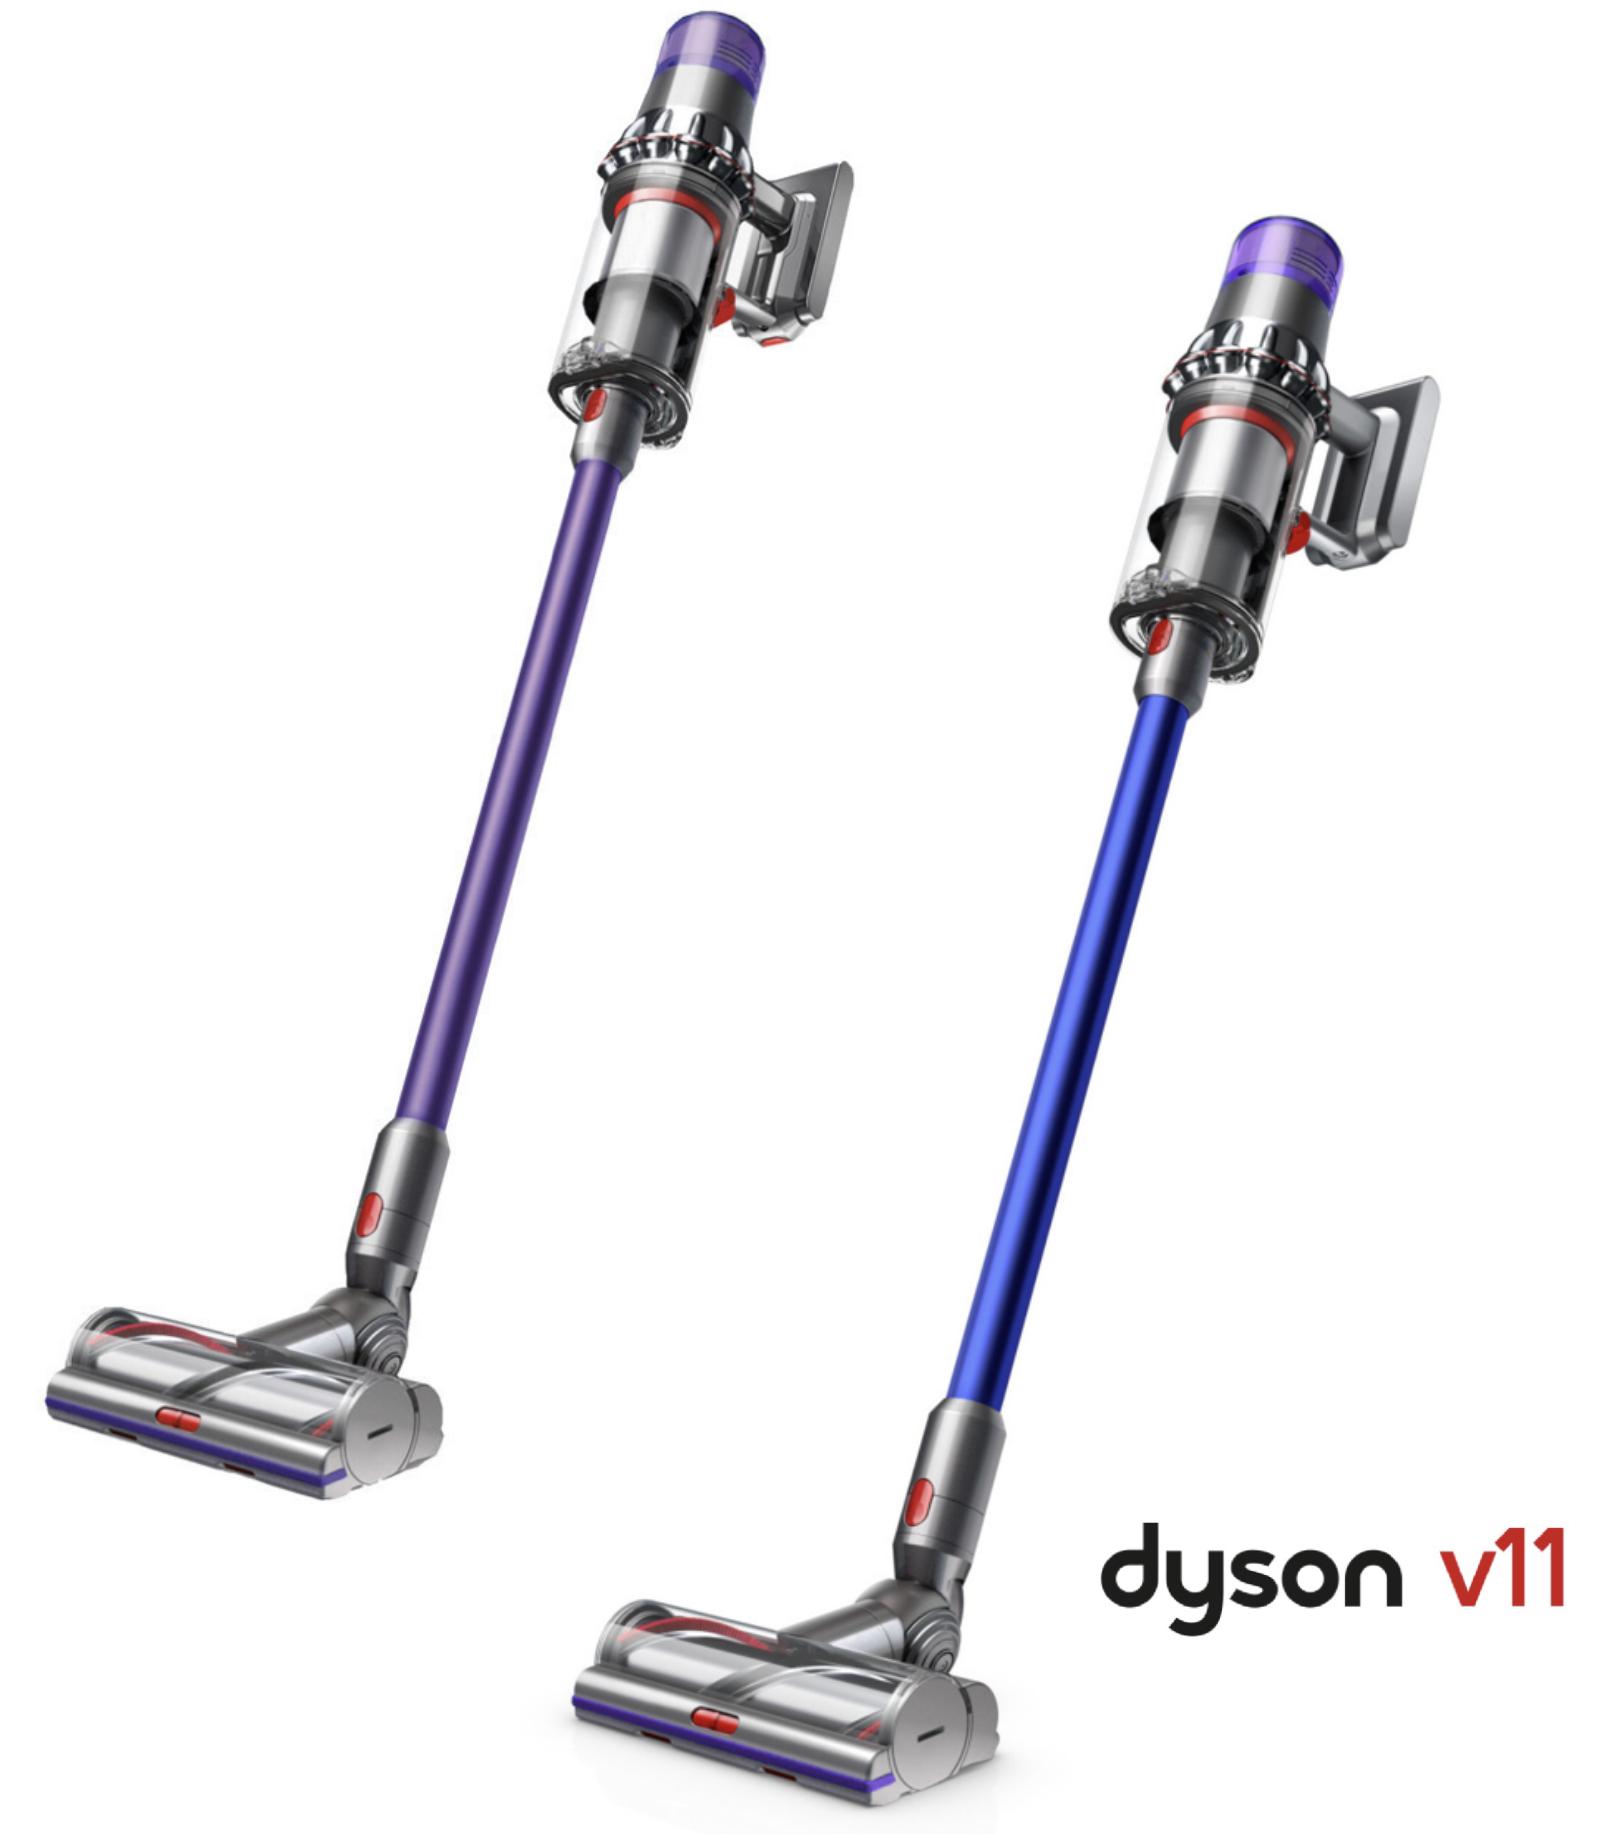 Dyson V11 Torque Drive Extra für 479,20€ bzw. Dyson V11 Absolute für 519,20€ inkl. Versandkosten